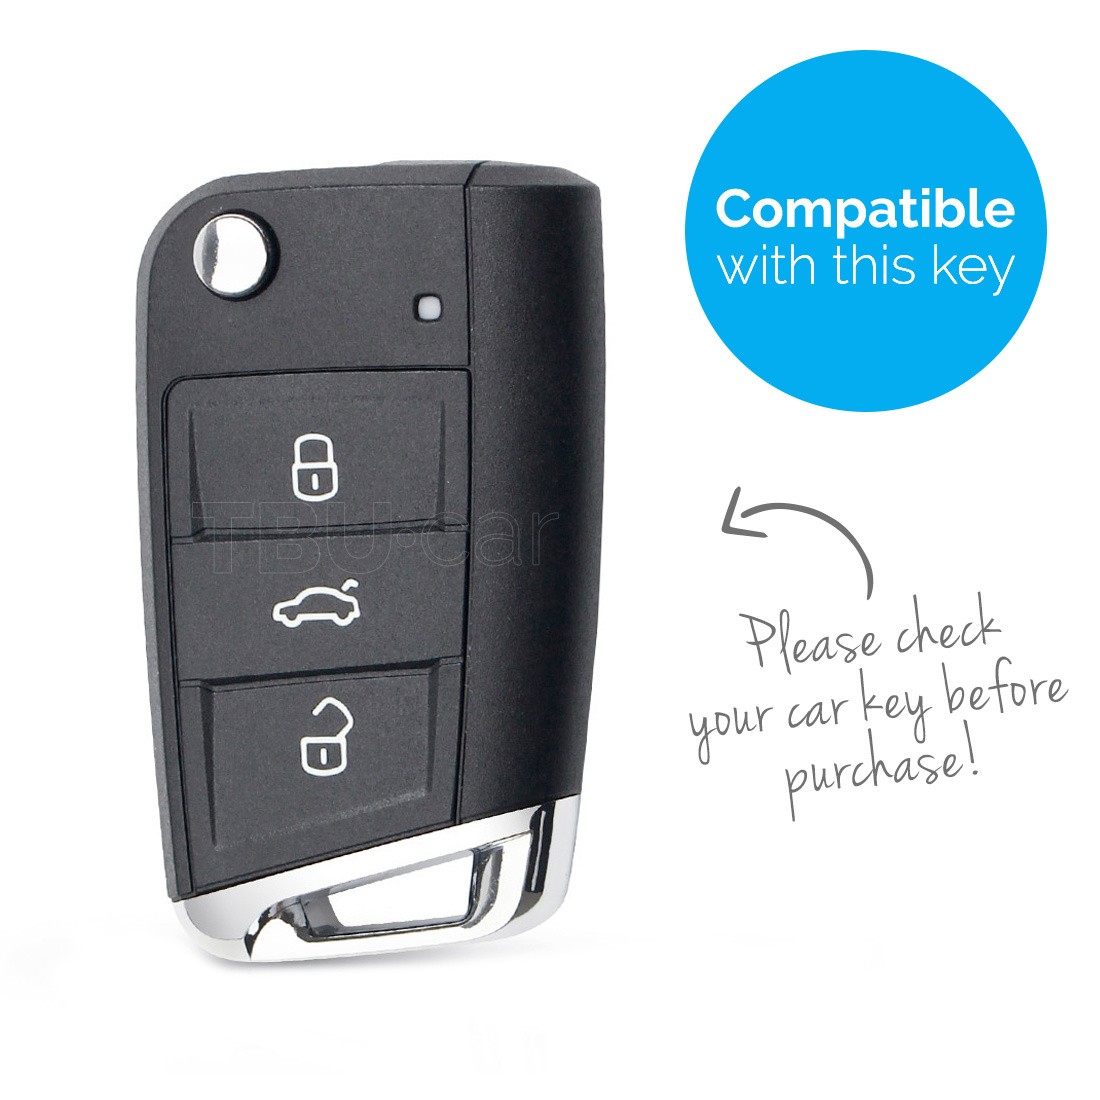 TBU car TBU car Autoschlüssel Hülle kompatibel mit Audi 3 Tasten - Schutzhülle aus Silikon - Auto Schlüsselhülle Cover in Im Dunkeln leuchten